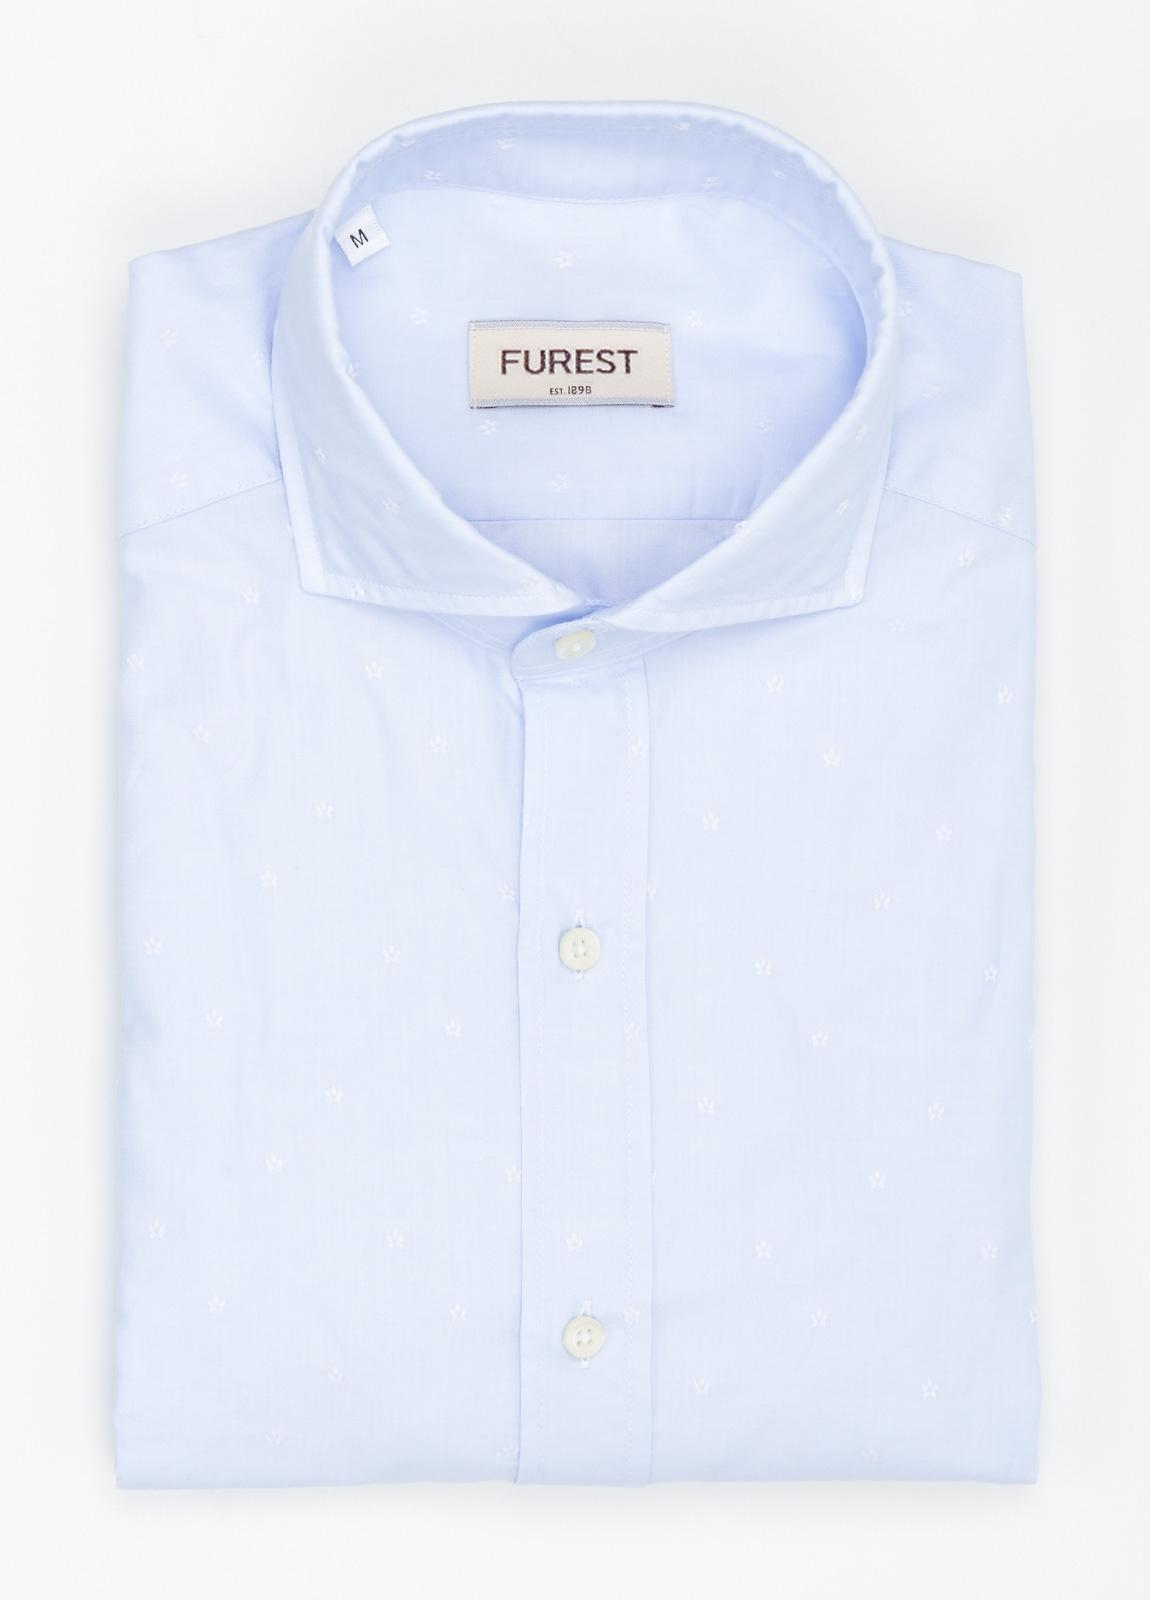 Camisa Leisure Wear SLIM FIT Modelo CAPRI estampado micro flor color azul celeste, 100% Algodón.